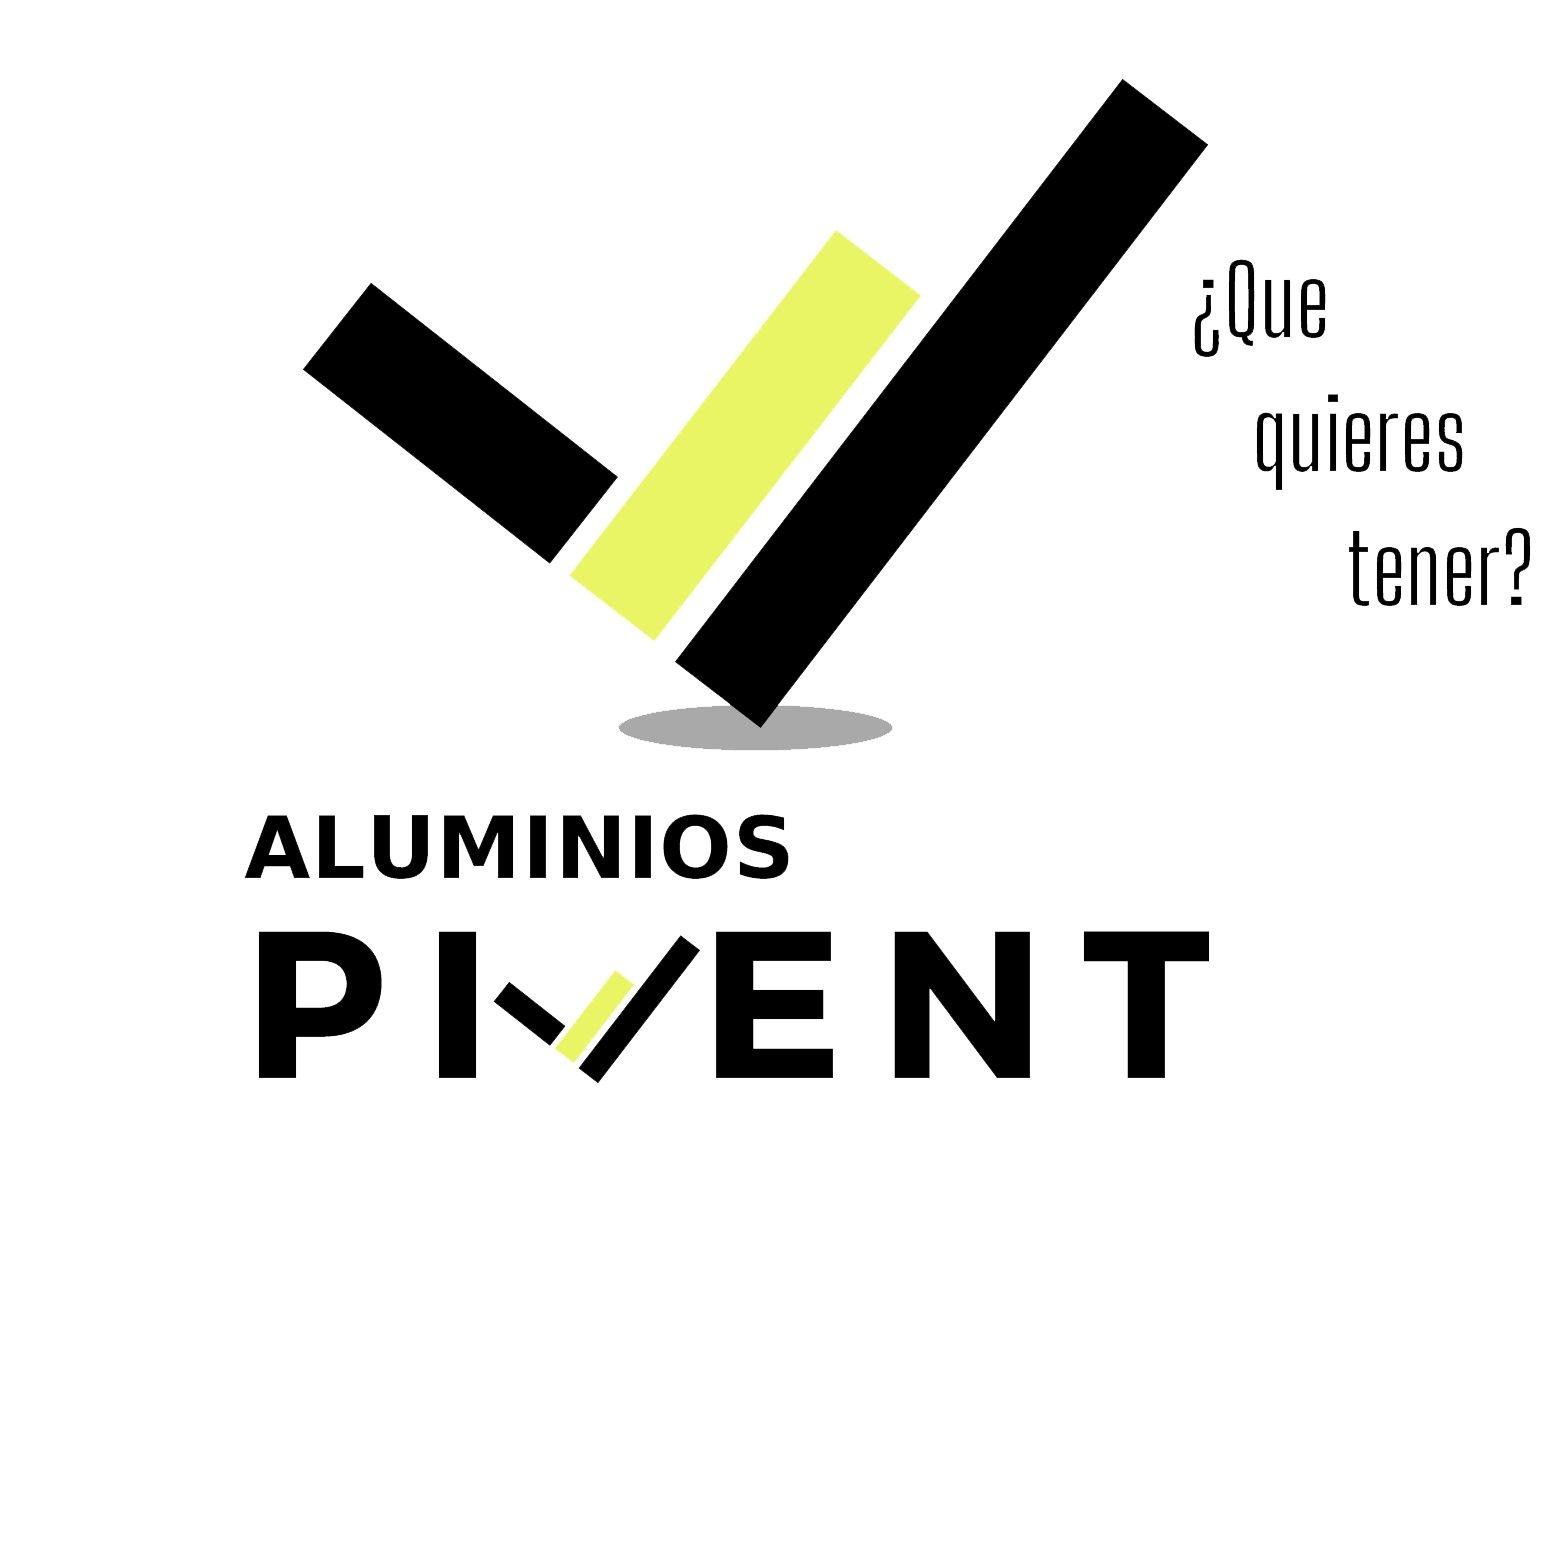 Aluminios Pivent